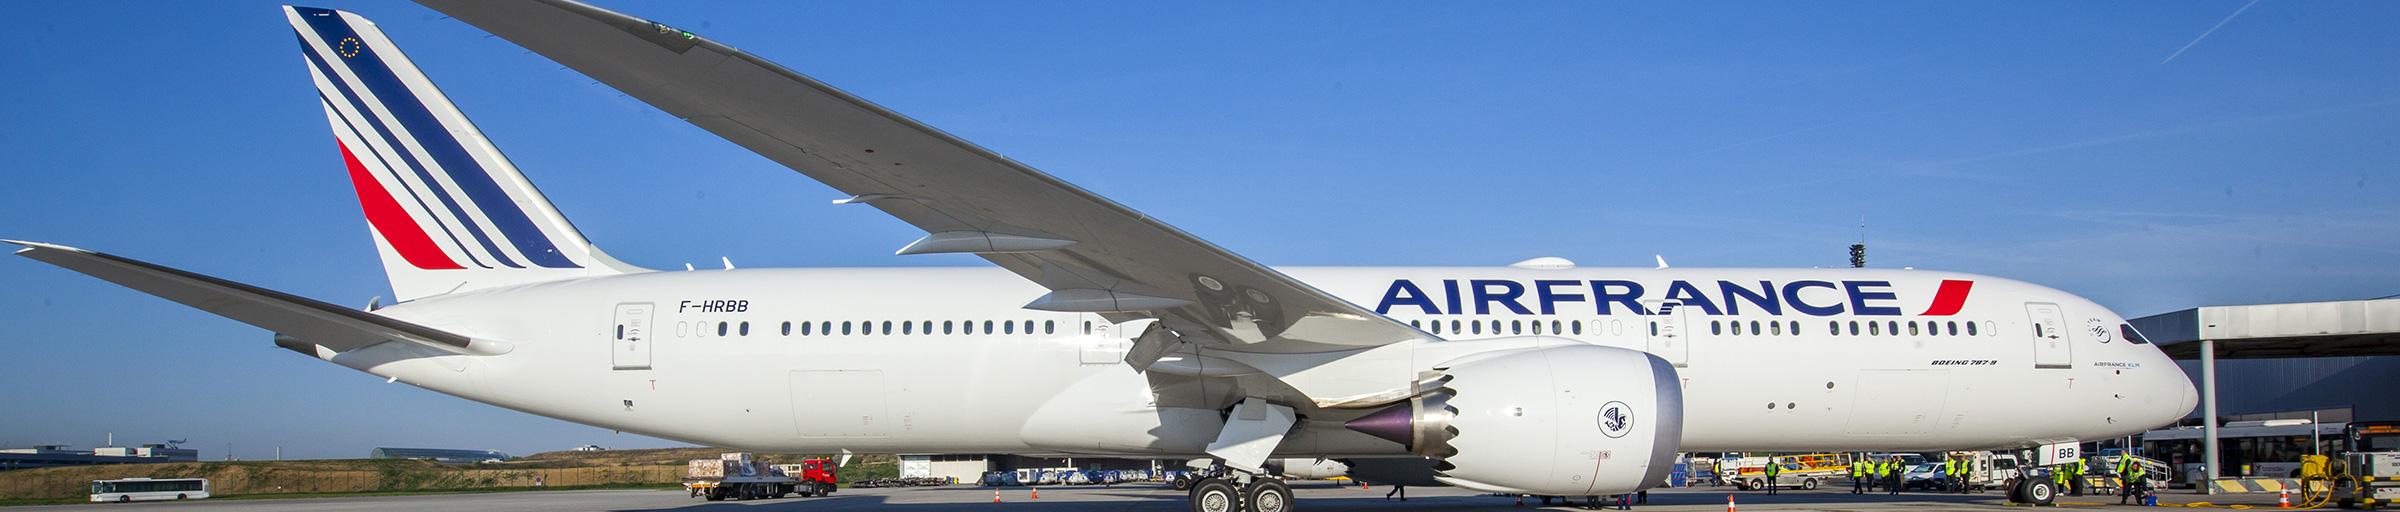 Air France AF 187 at McCarran